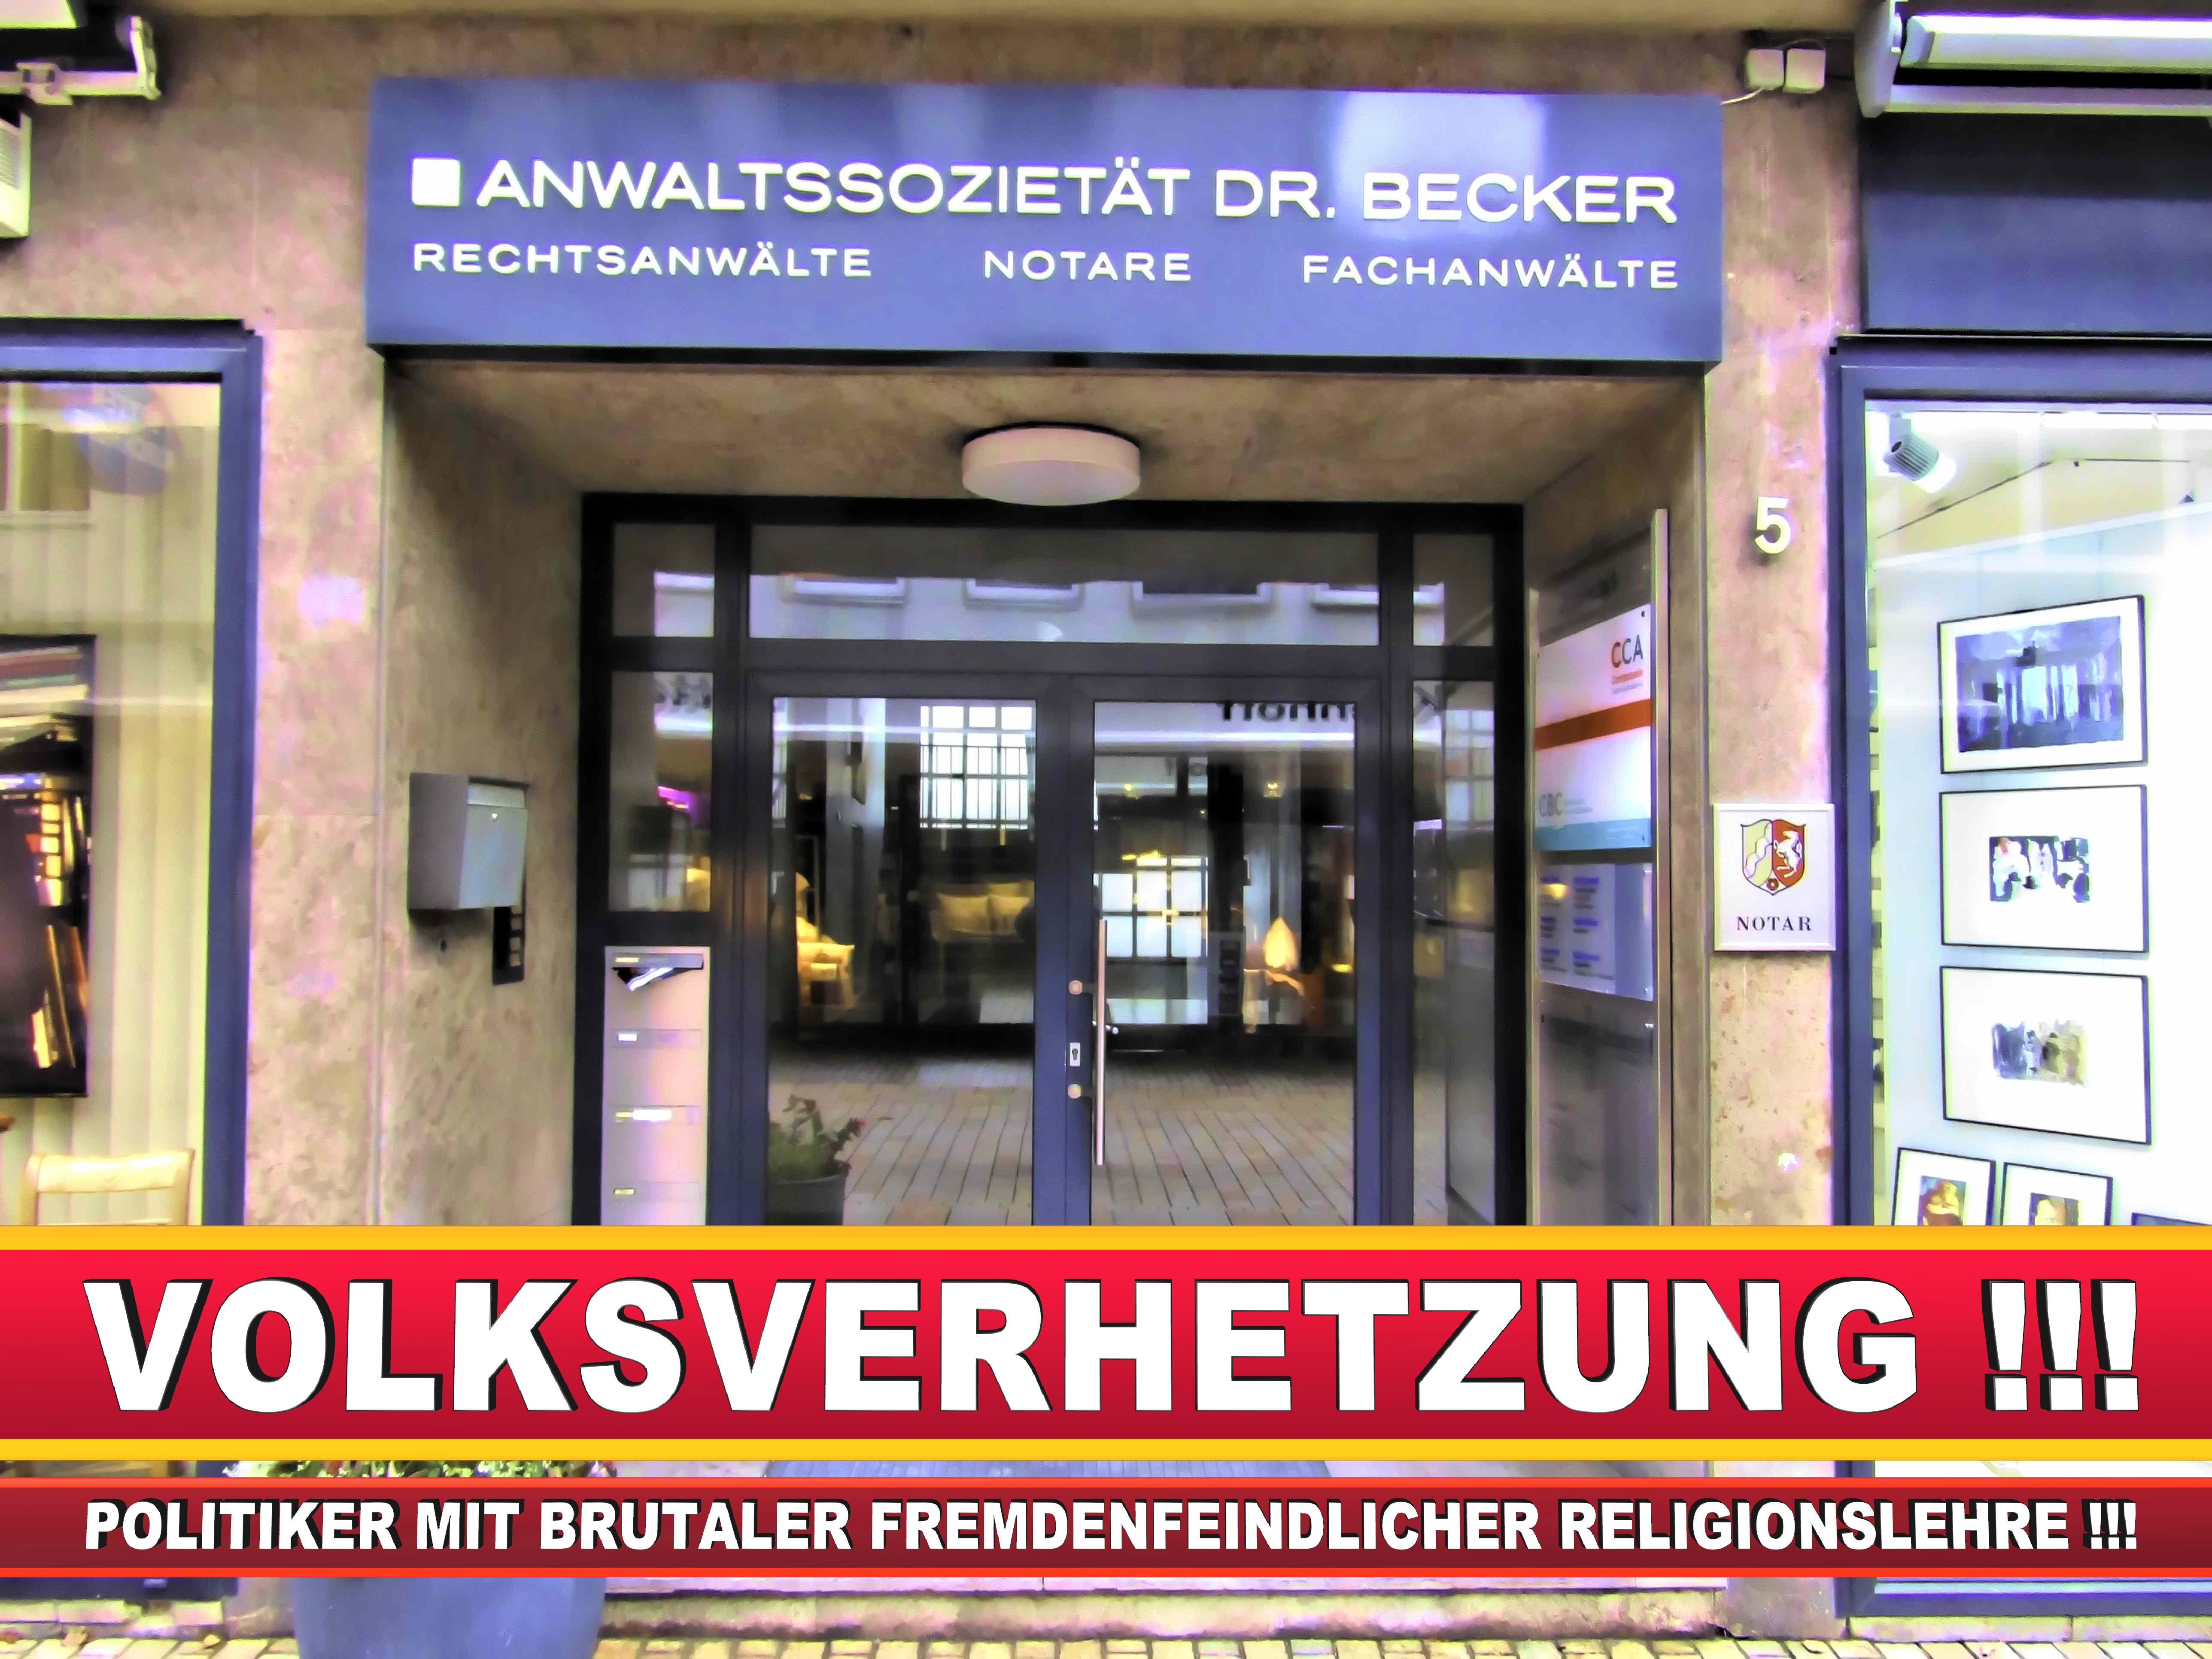 RECHTSANWALT DR THORSTEN FELDMANN CDU BIELEFELD RECHTSANWALT UND NOTAR A D WERNER KAUP LANDTAGSWAHL BUNDESTAGSWA L BÜRGERMEISTER AHL NRW (3)